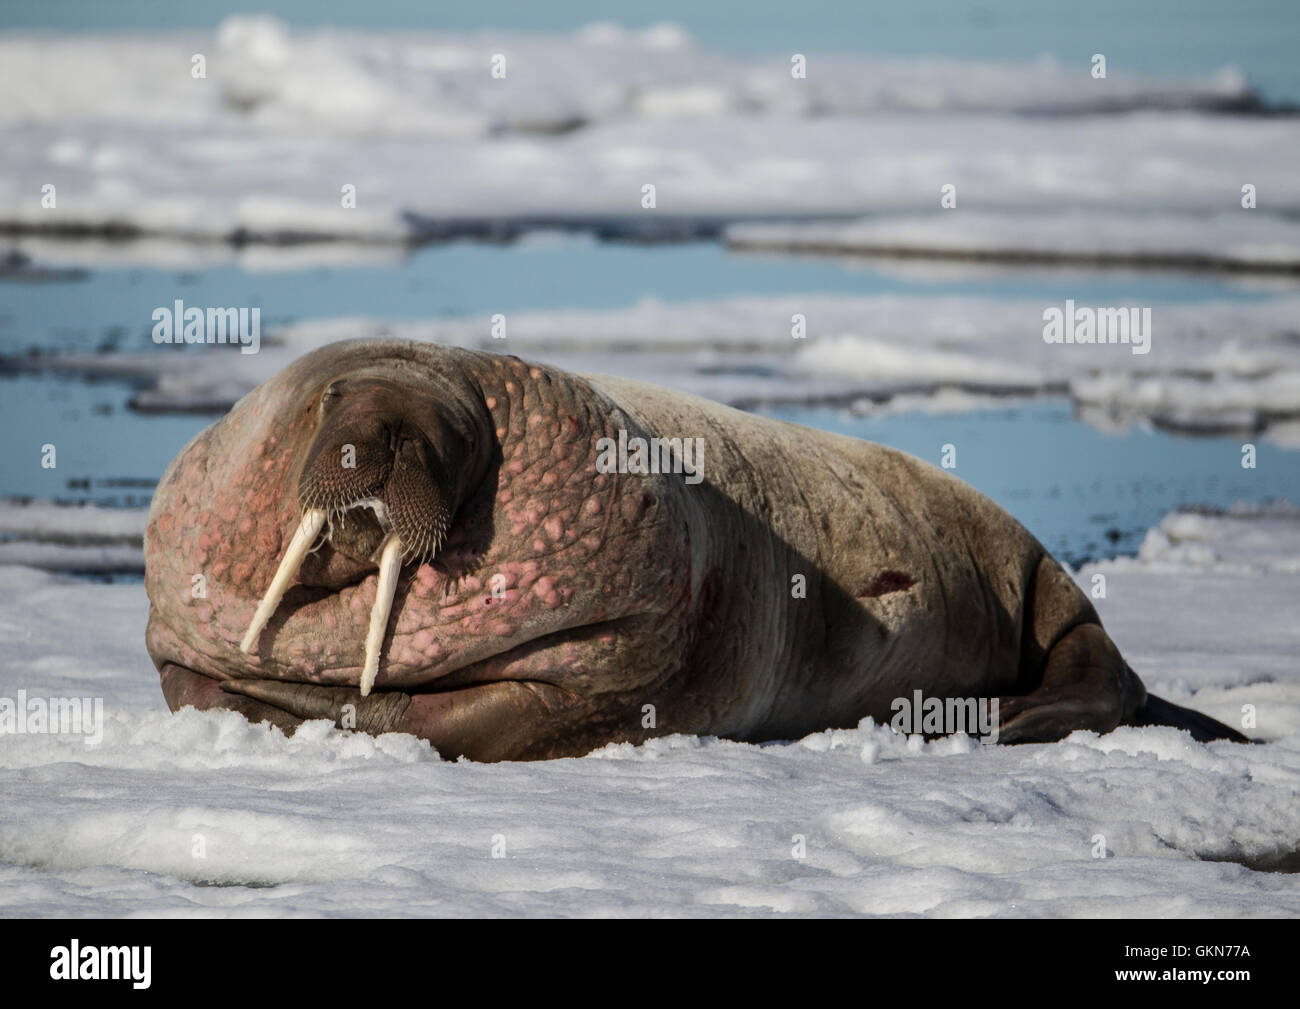 Walrus on the snow, Svalbard, Norwegian Arctic - Stock Image